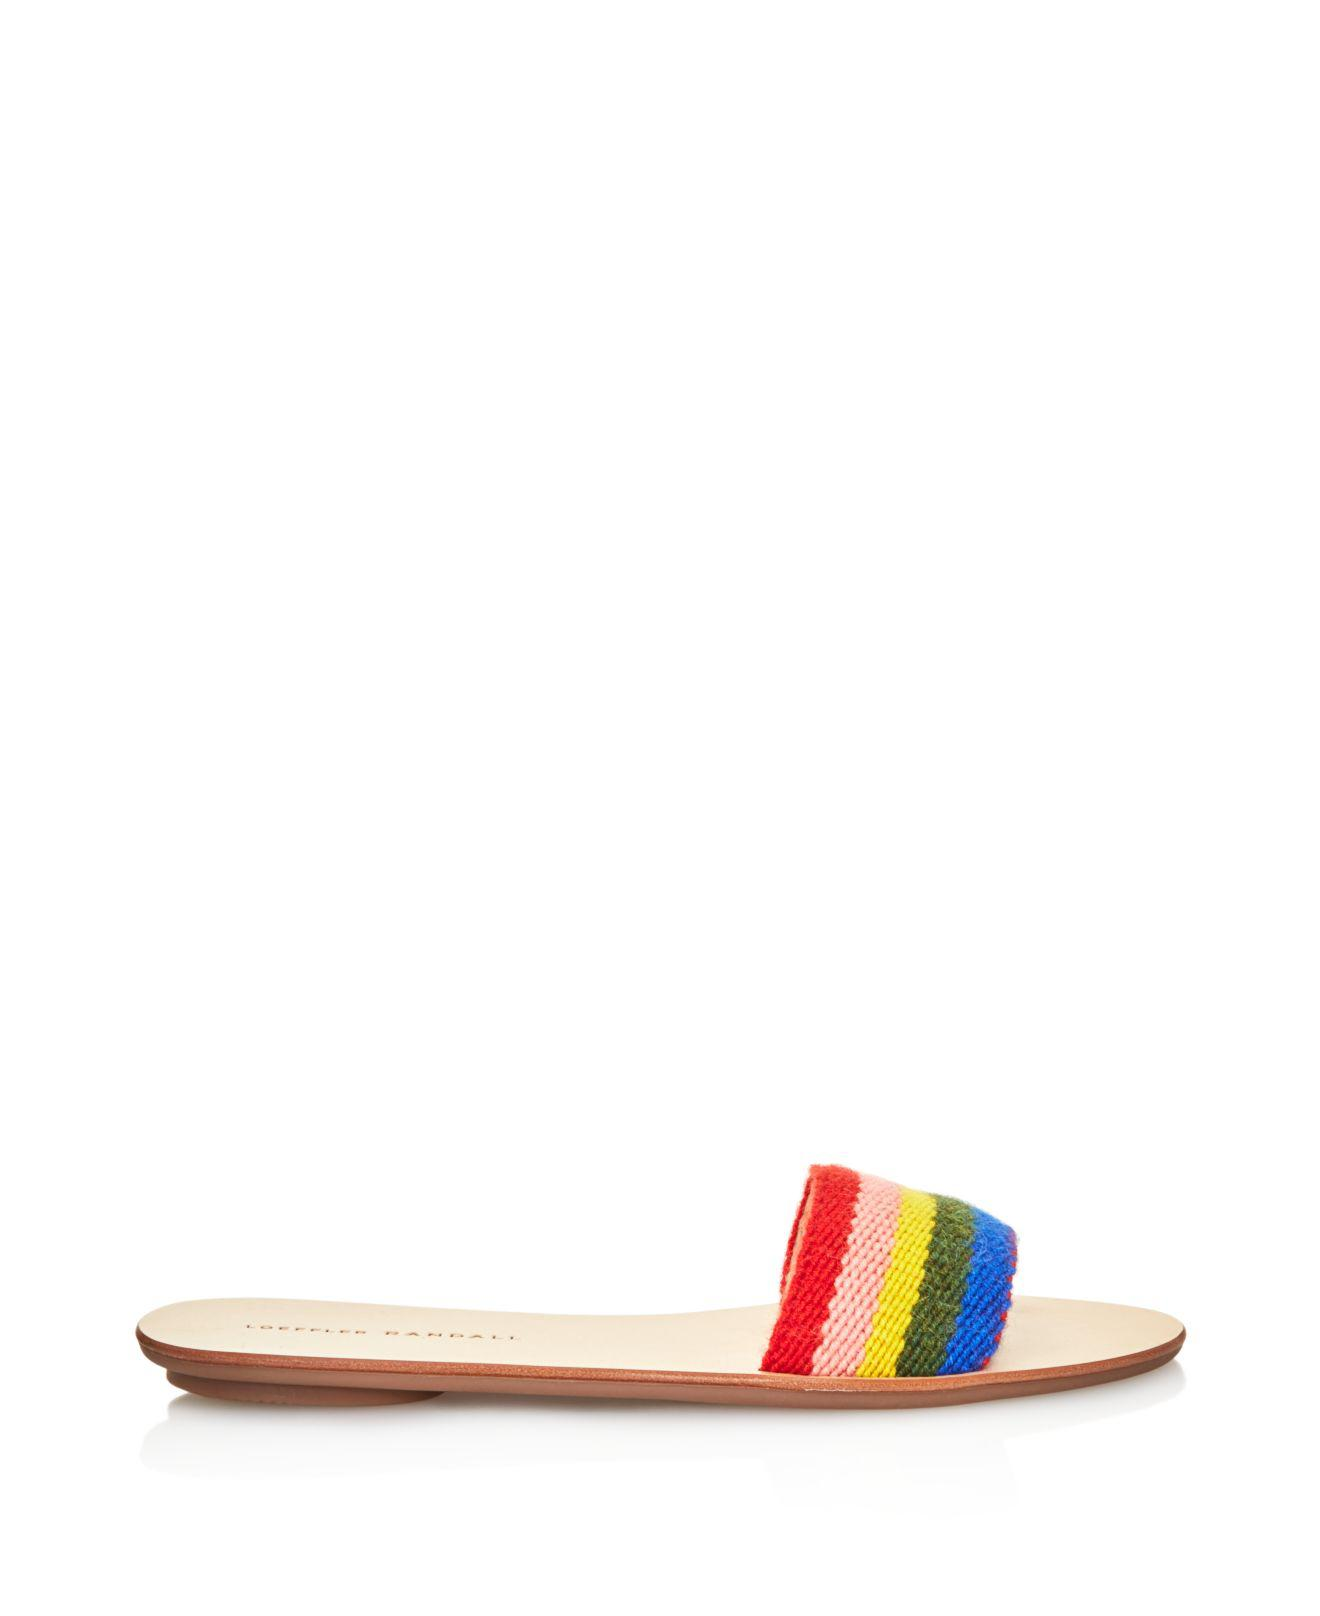 Loeffler Randall Women's Stella Alpaca Rainbow Slide Sandals iZQ1UTW